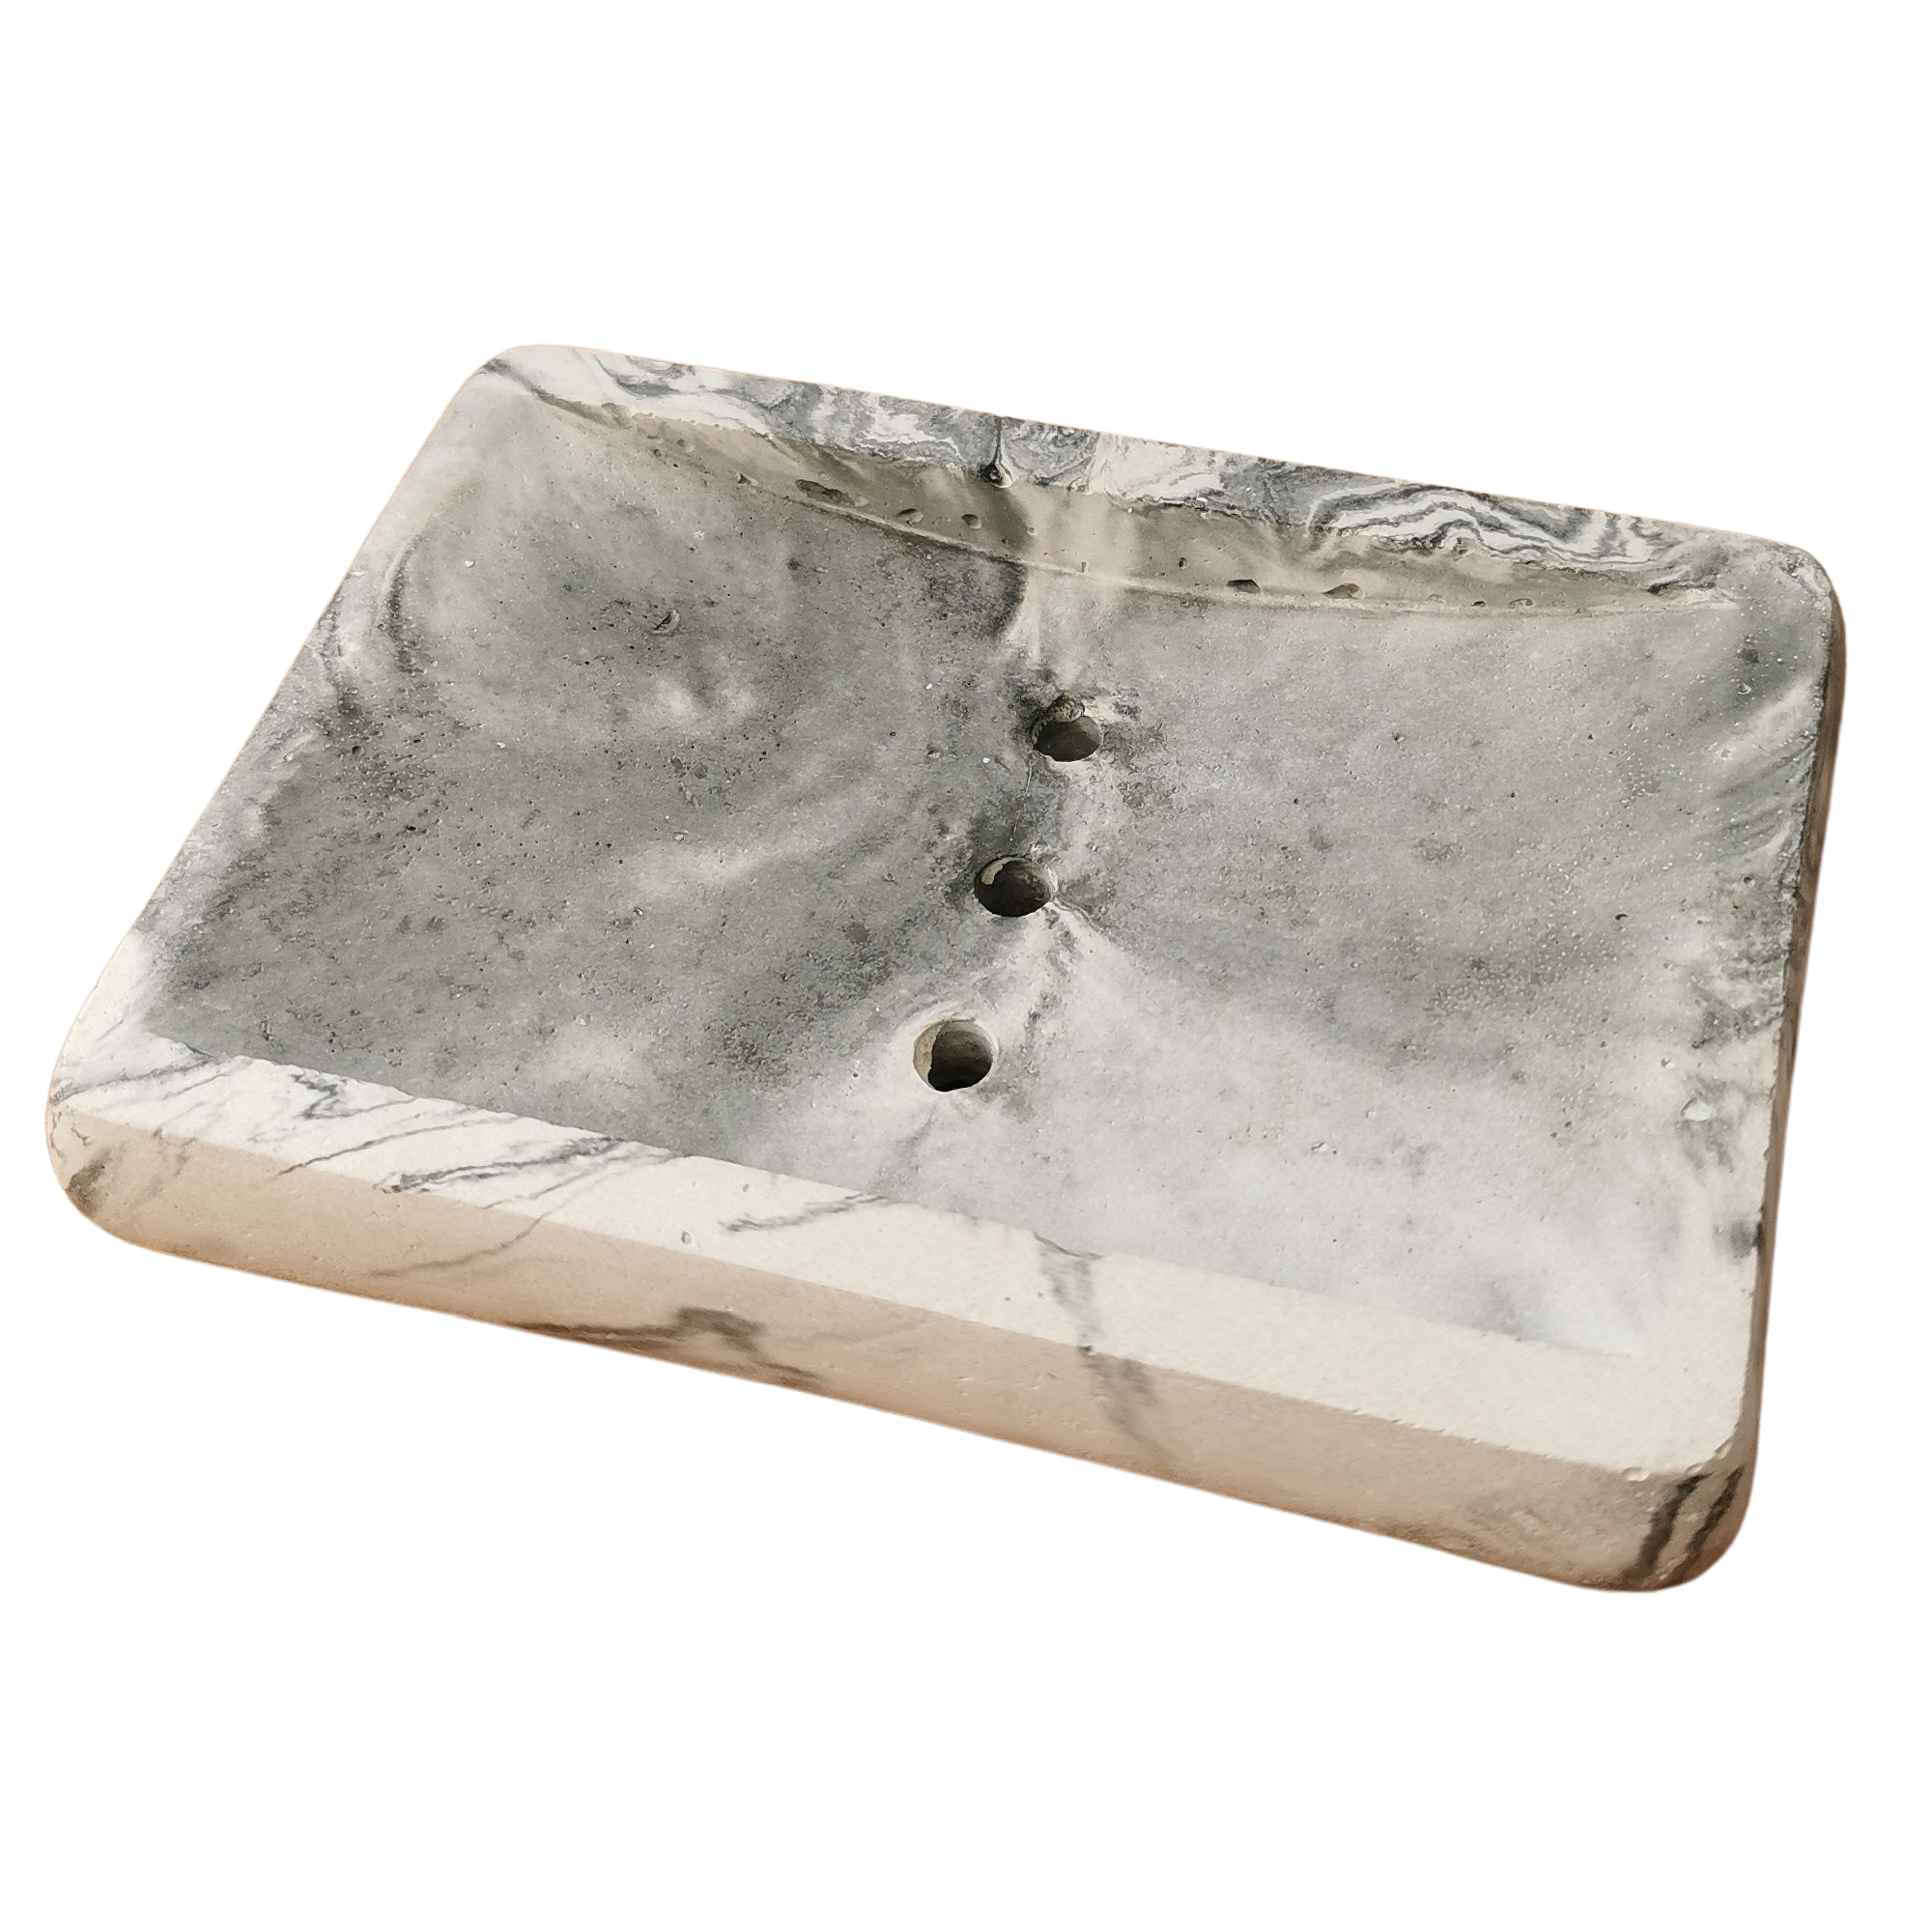 Dook Luxury Handmade Salt Soap